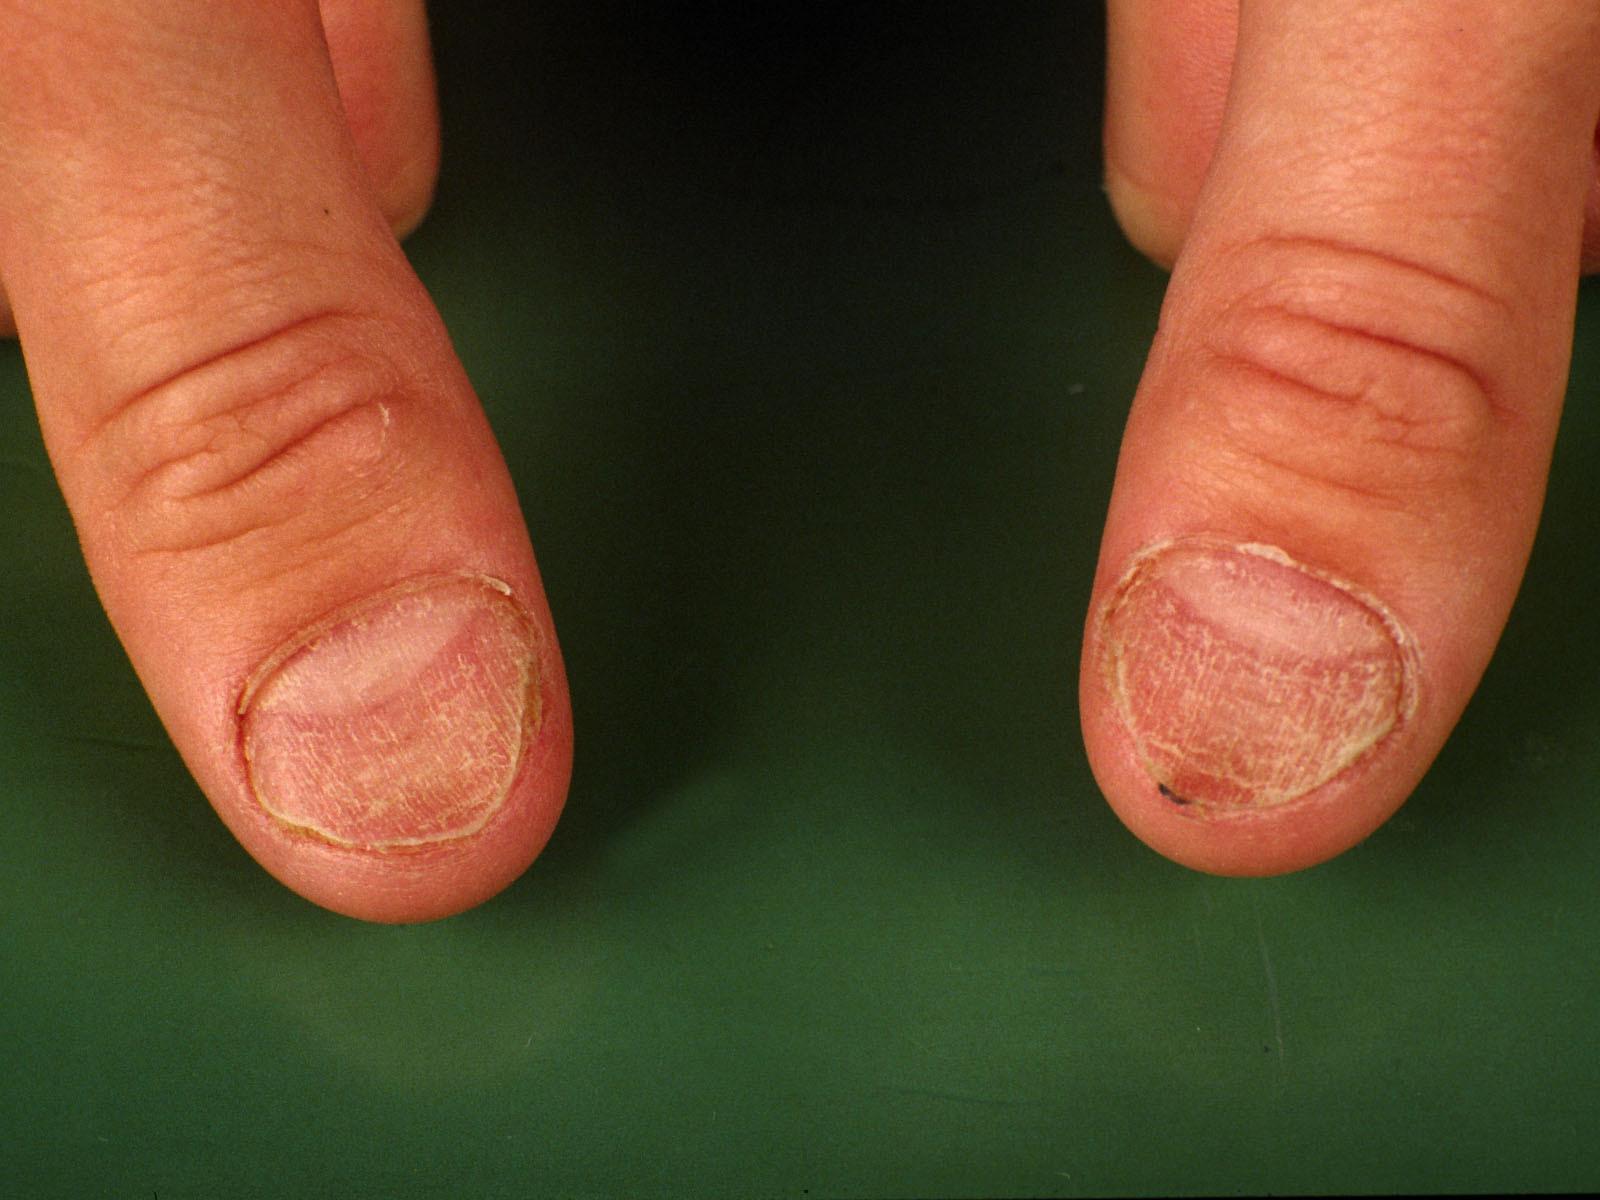 Koilonychia (spoon nails, lepeltjes nagels)